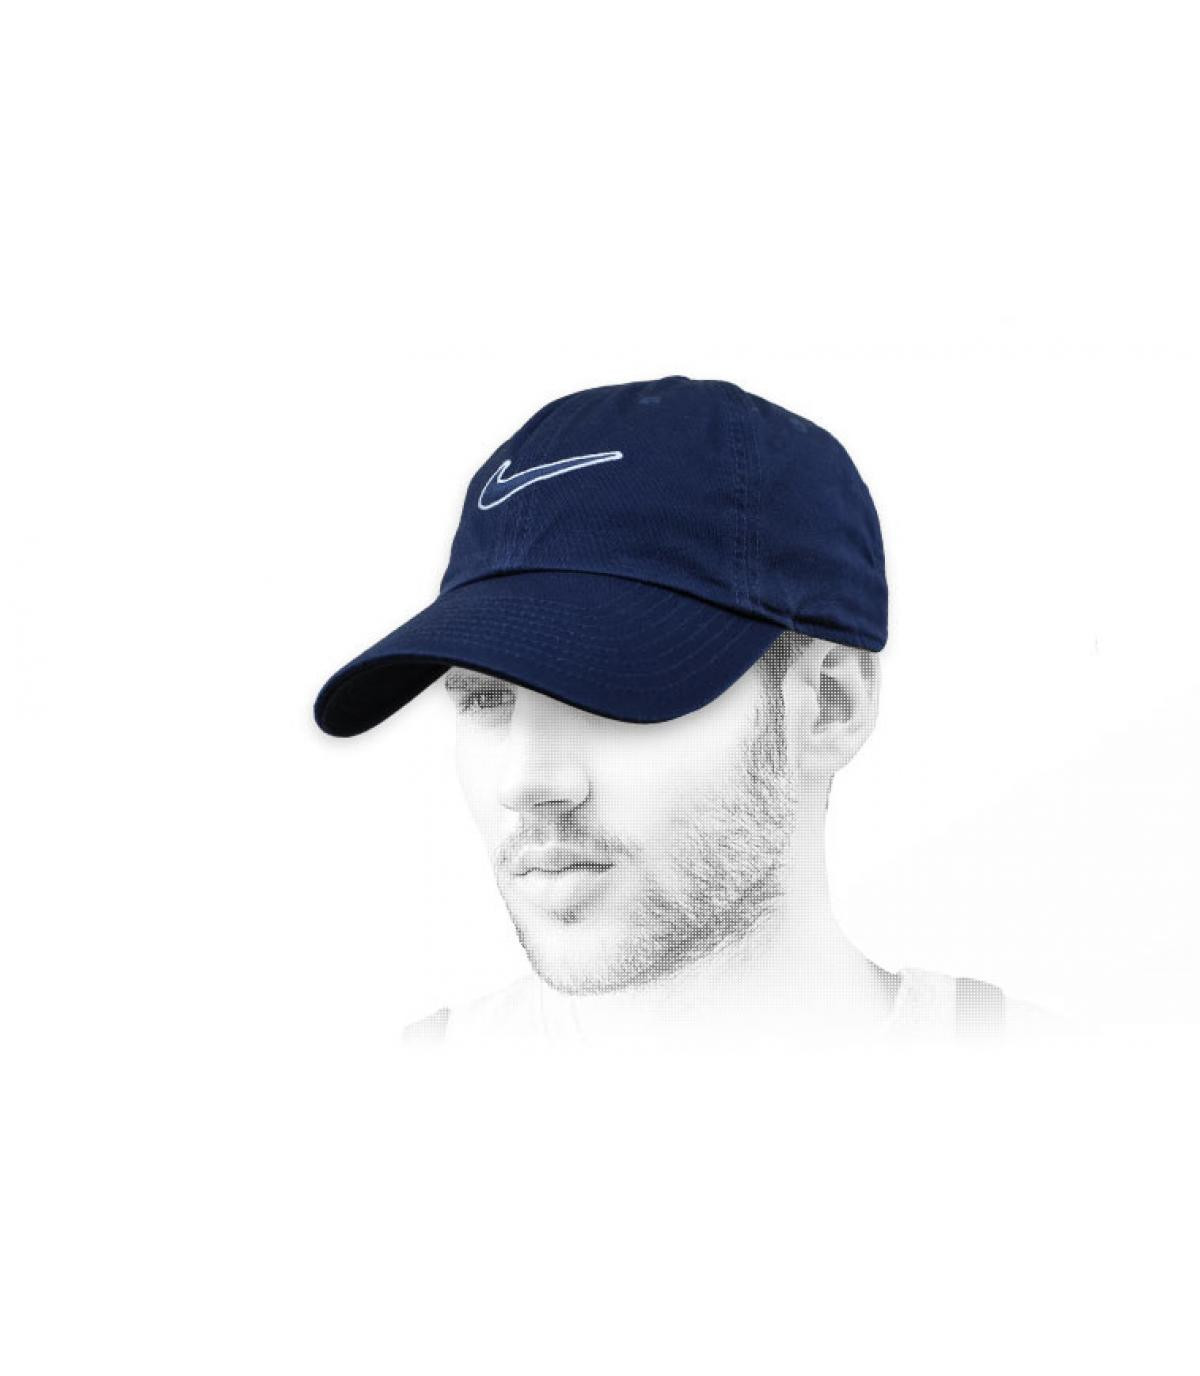 casquette Nike swoosh noir